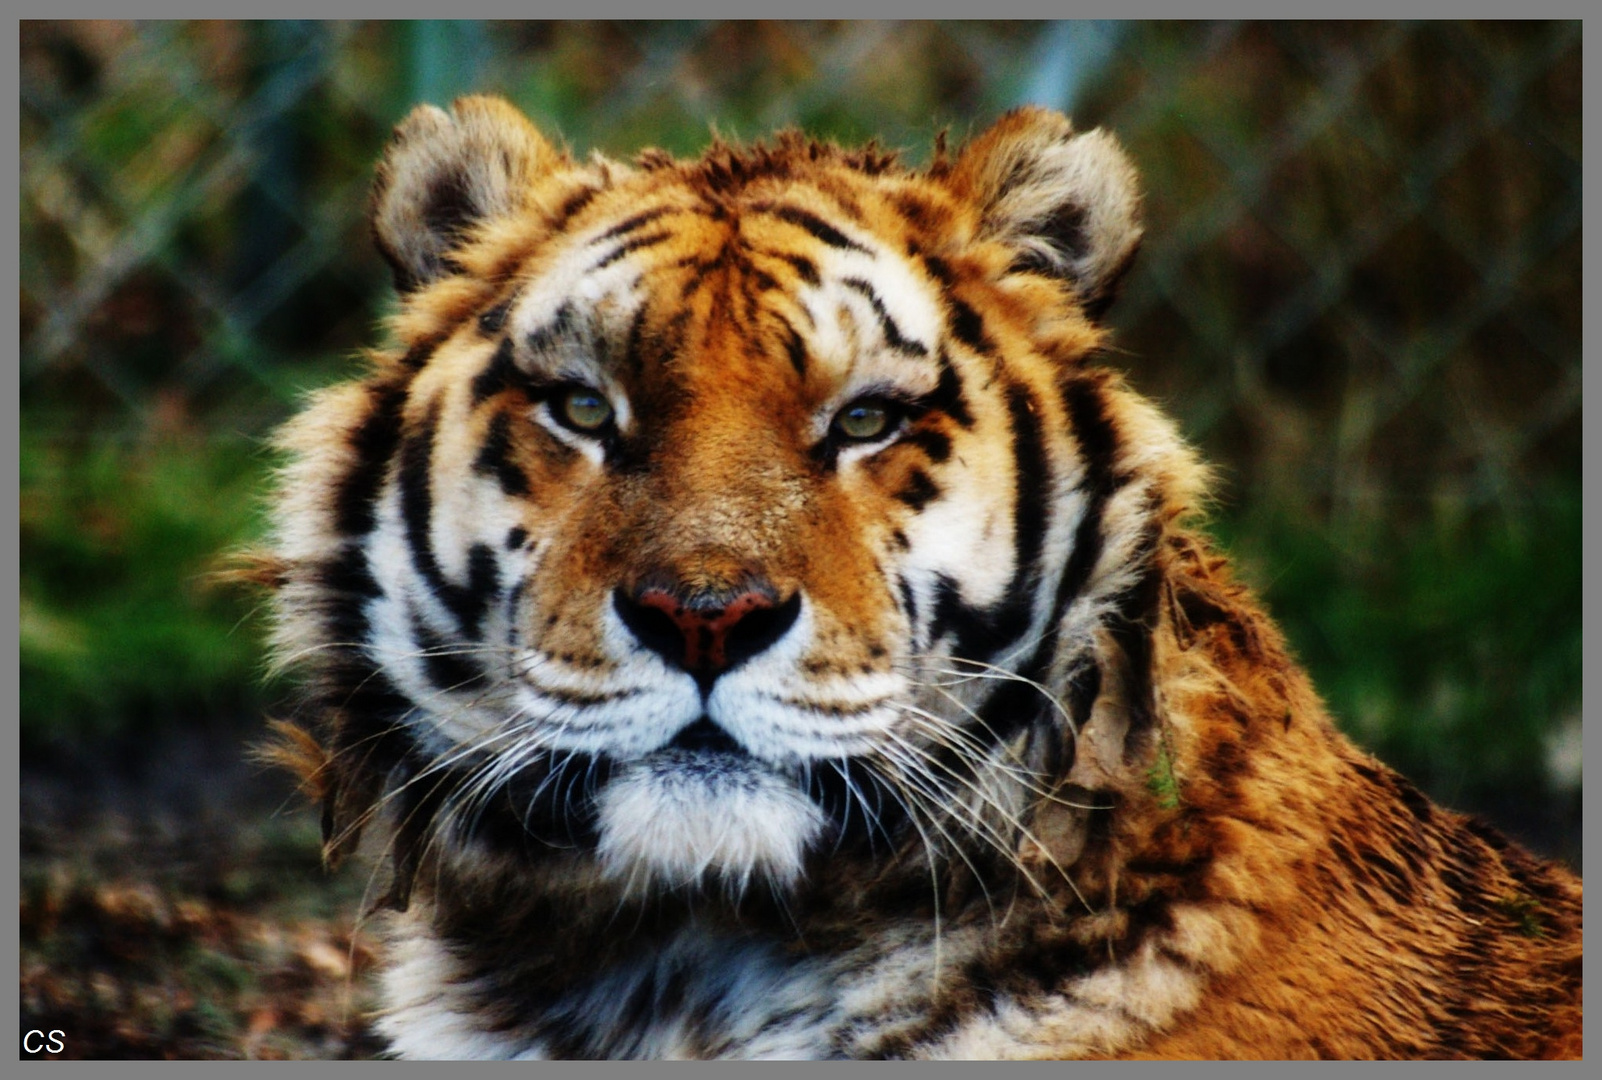 le regard du tigre